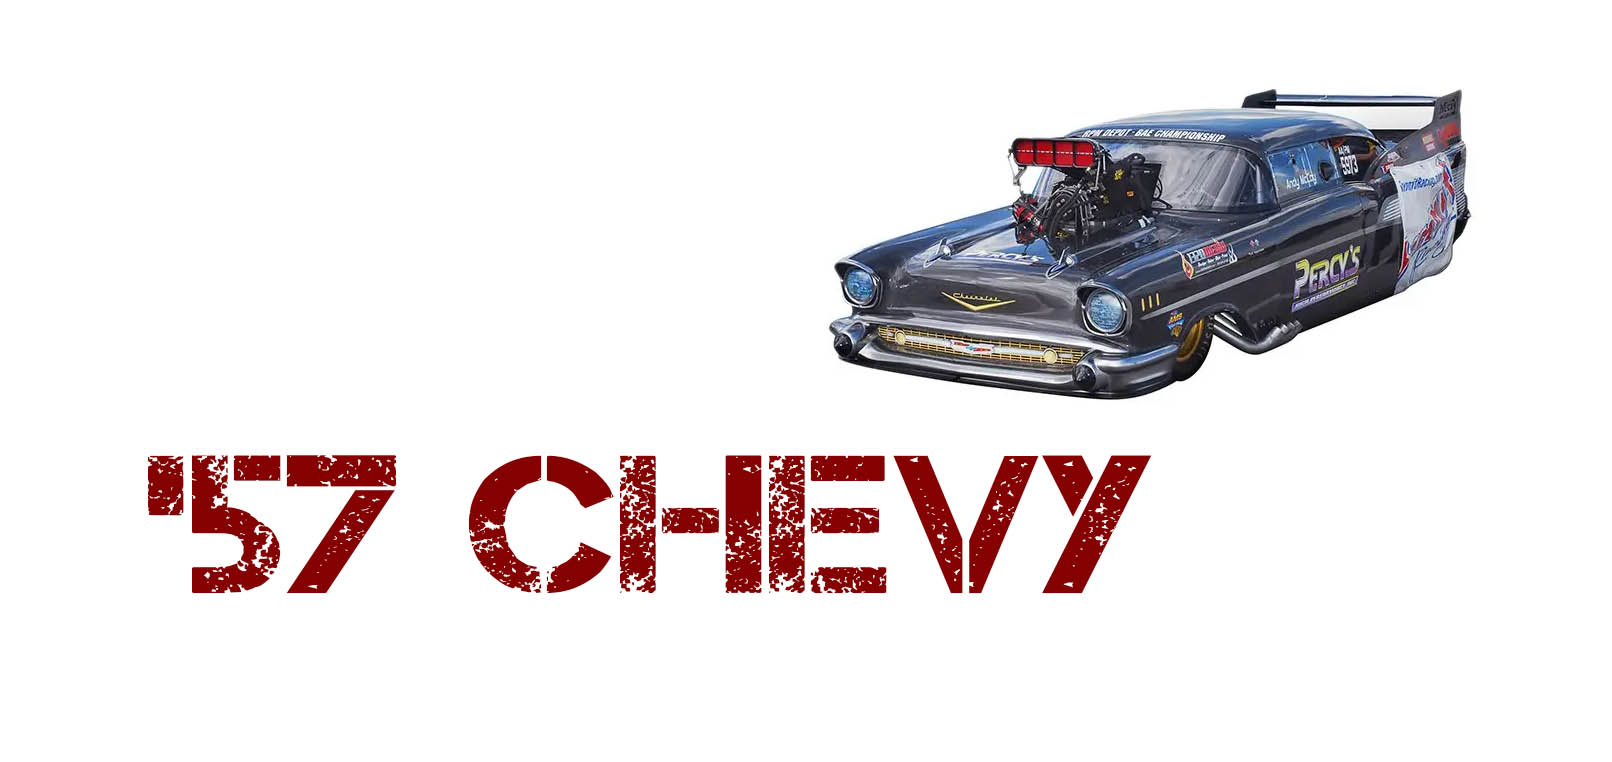 57 chevy carbon fiber body kit